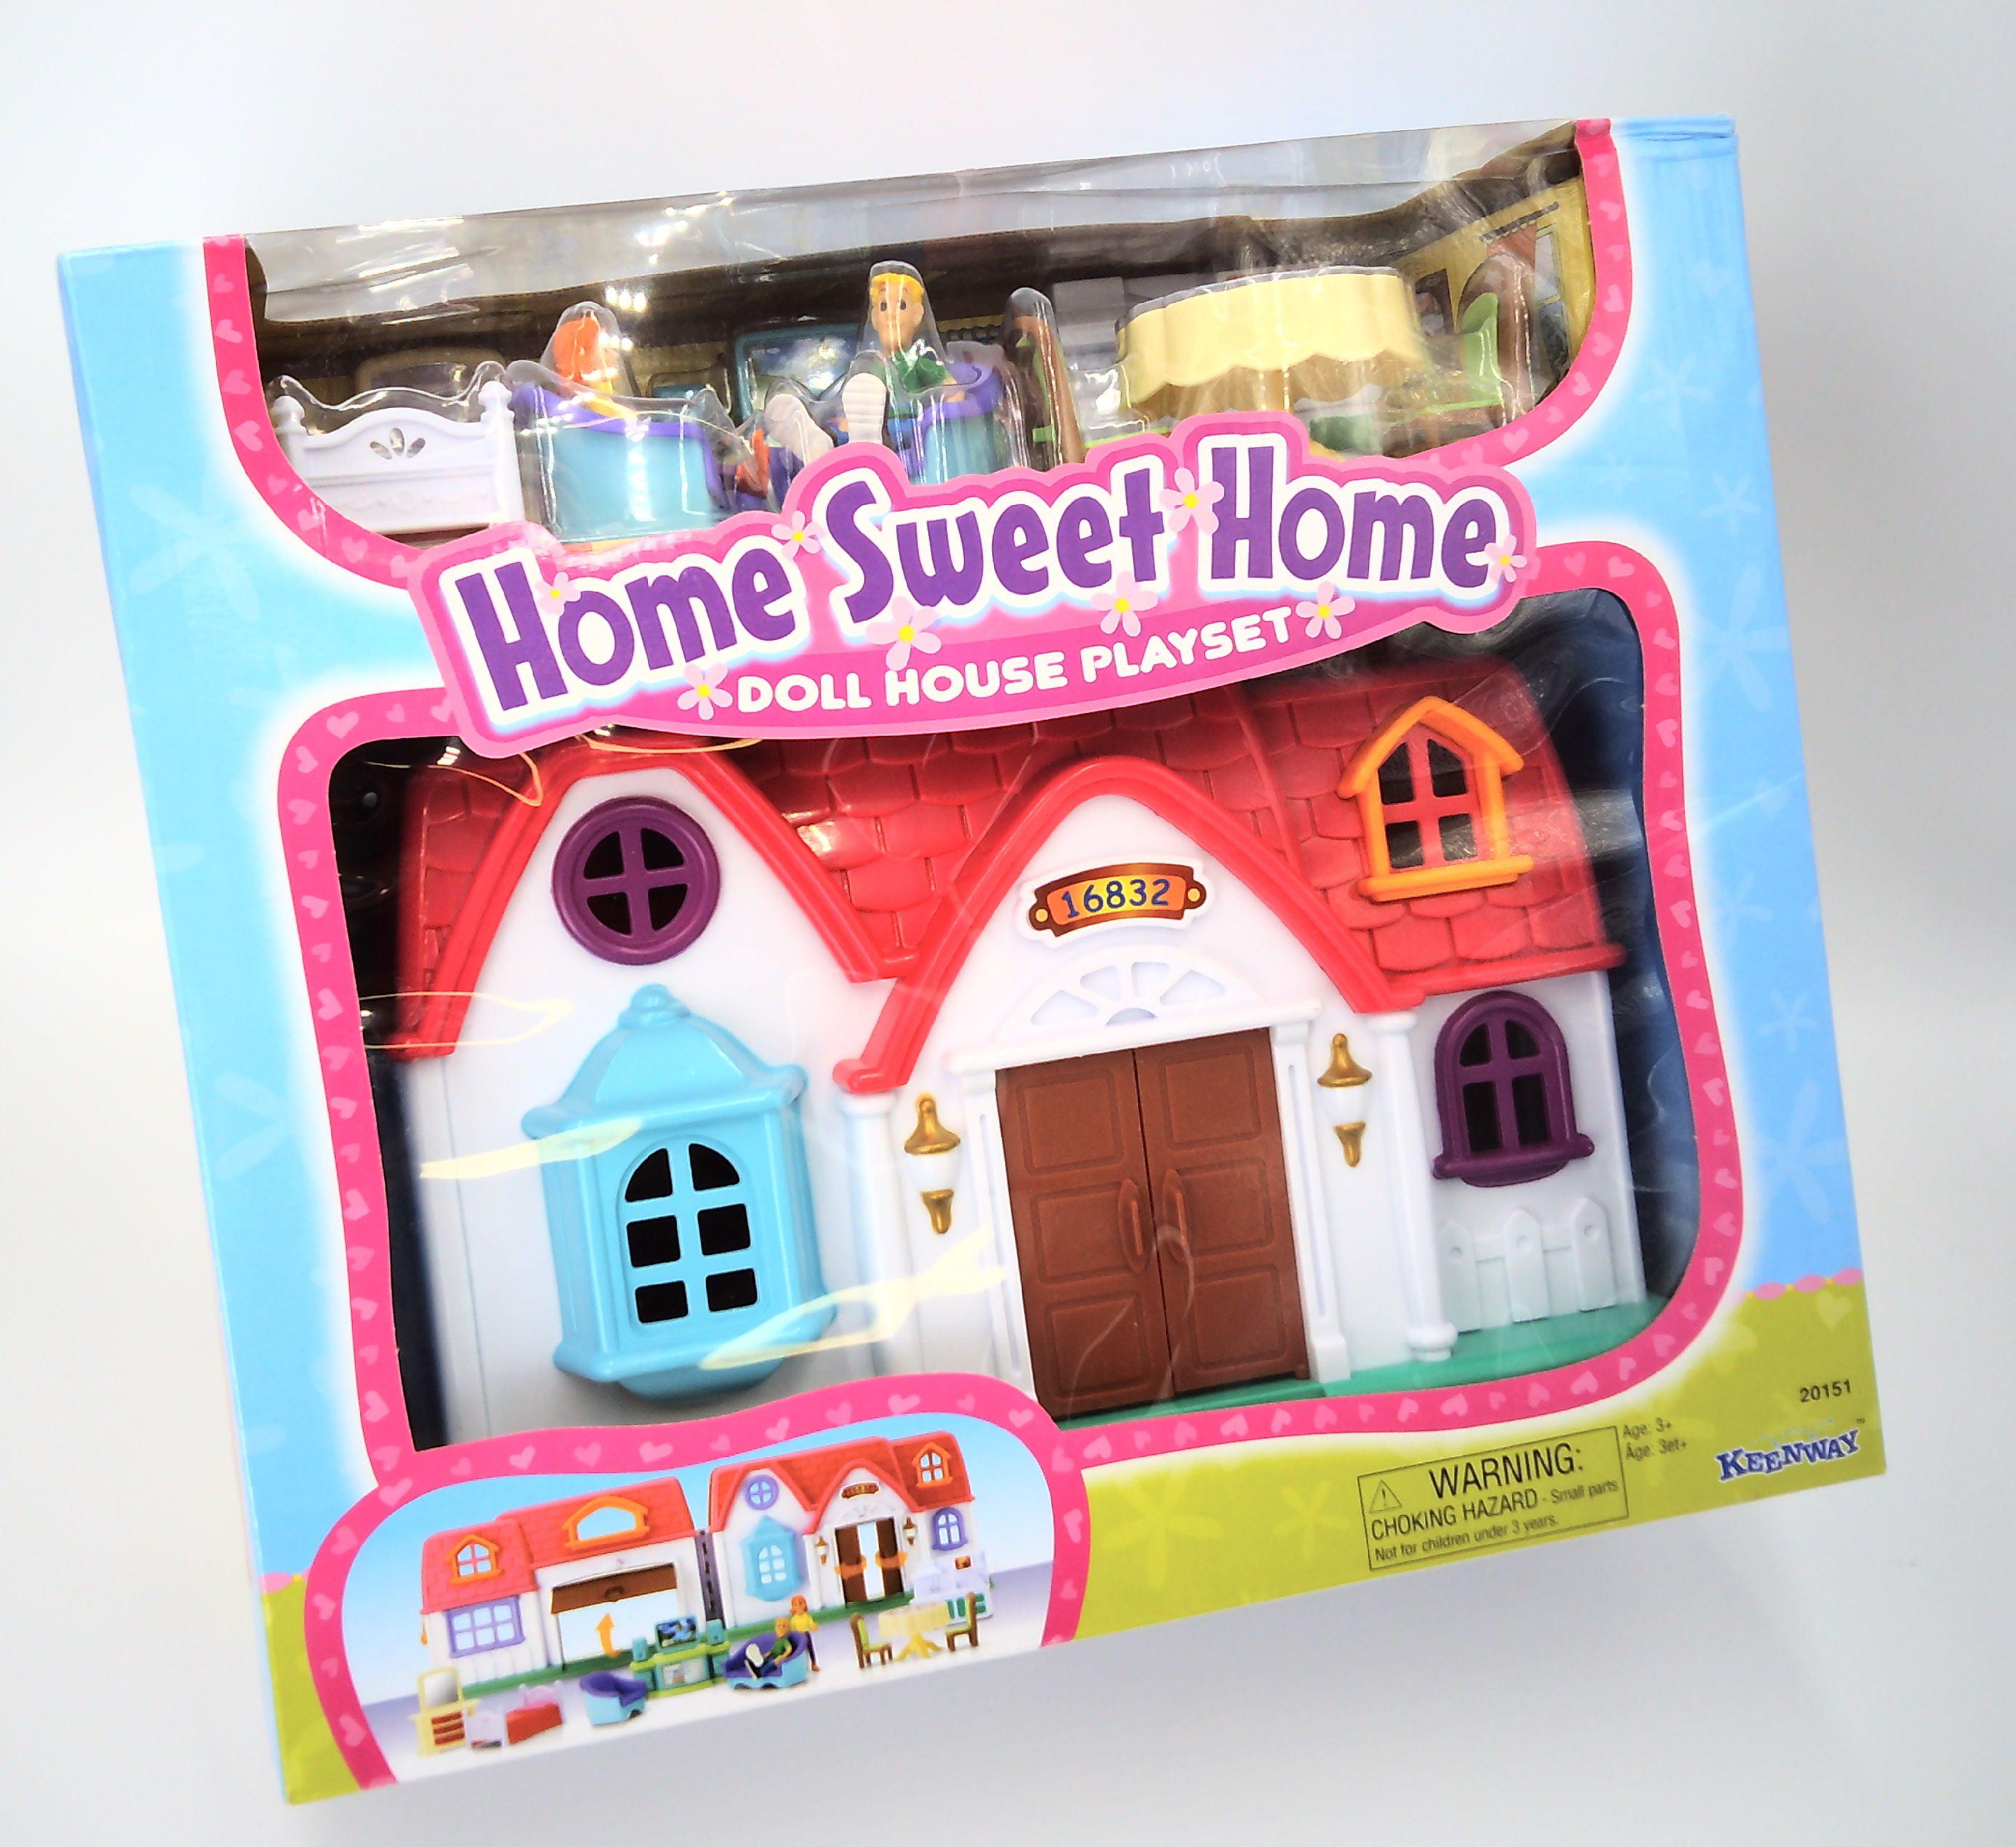 cfec528dce4 Home Sweet Home Doll House Play Set - Walmart.com